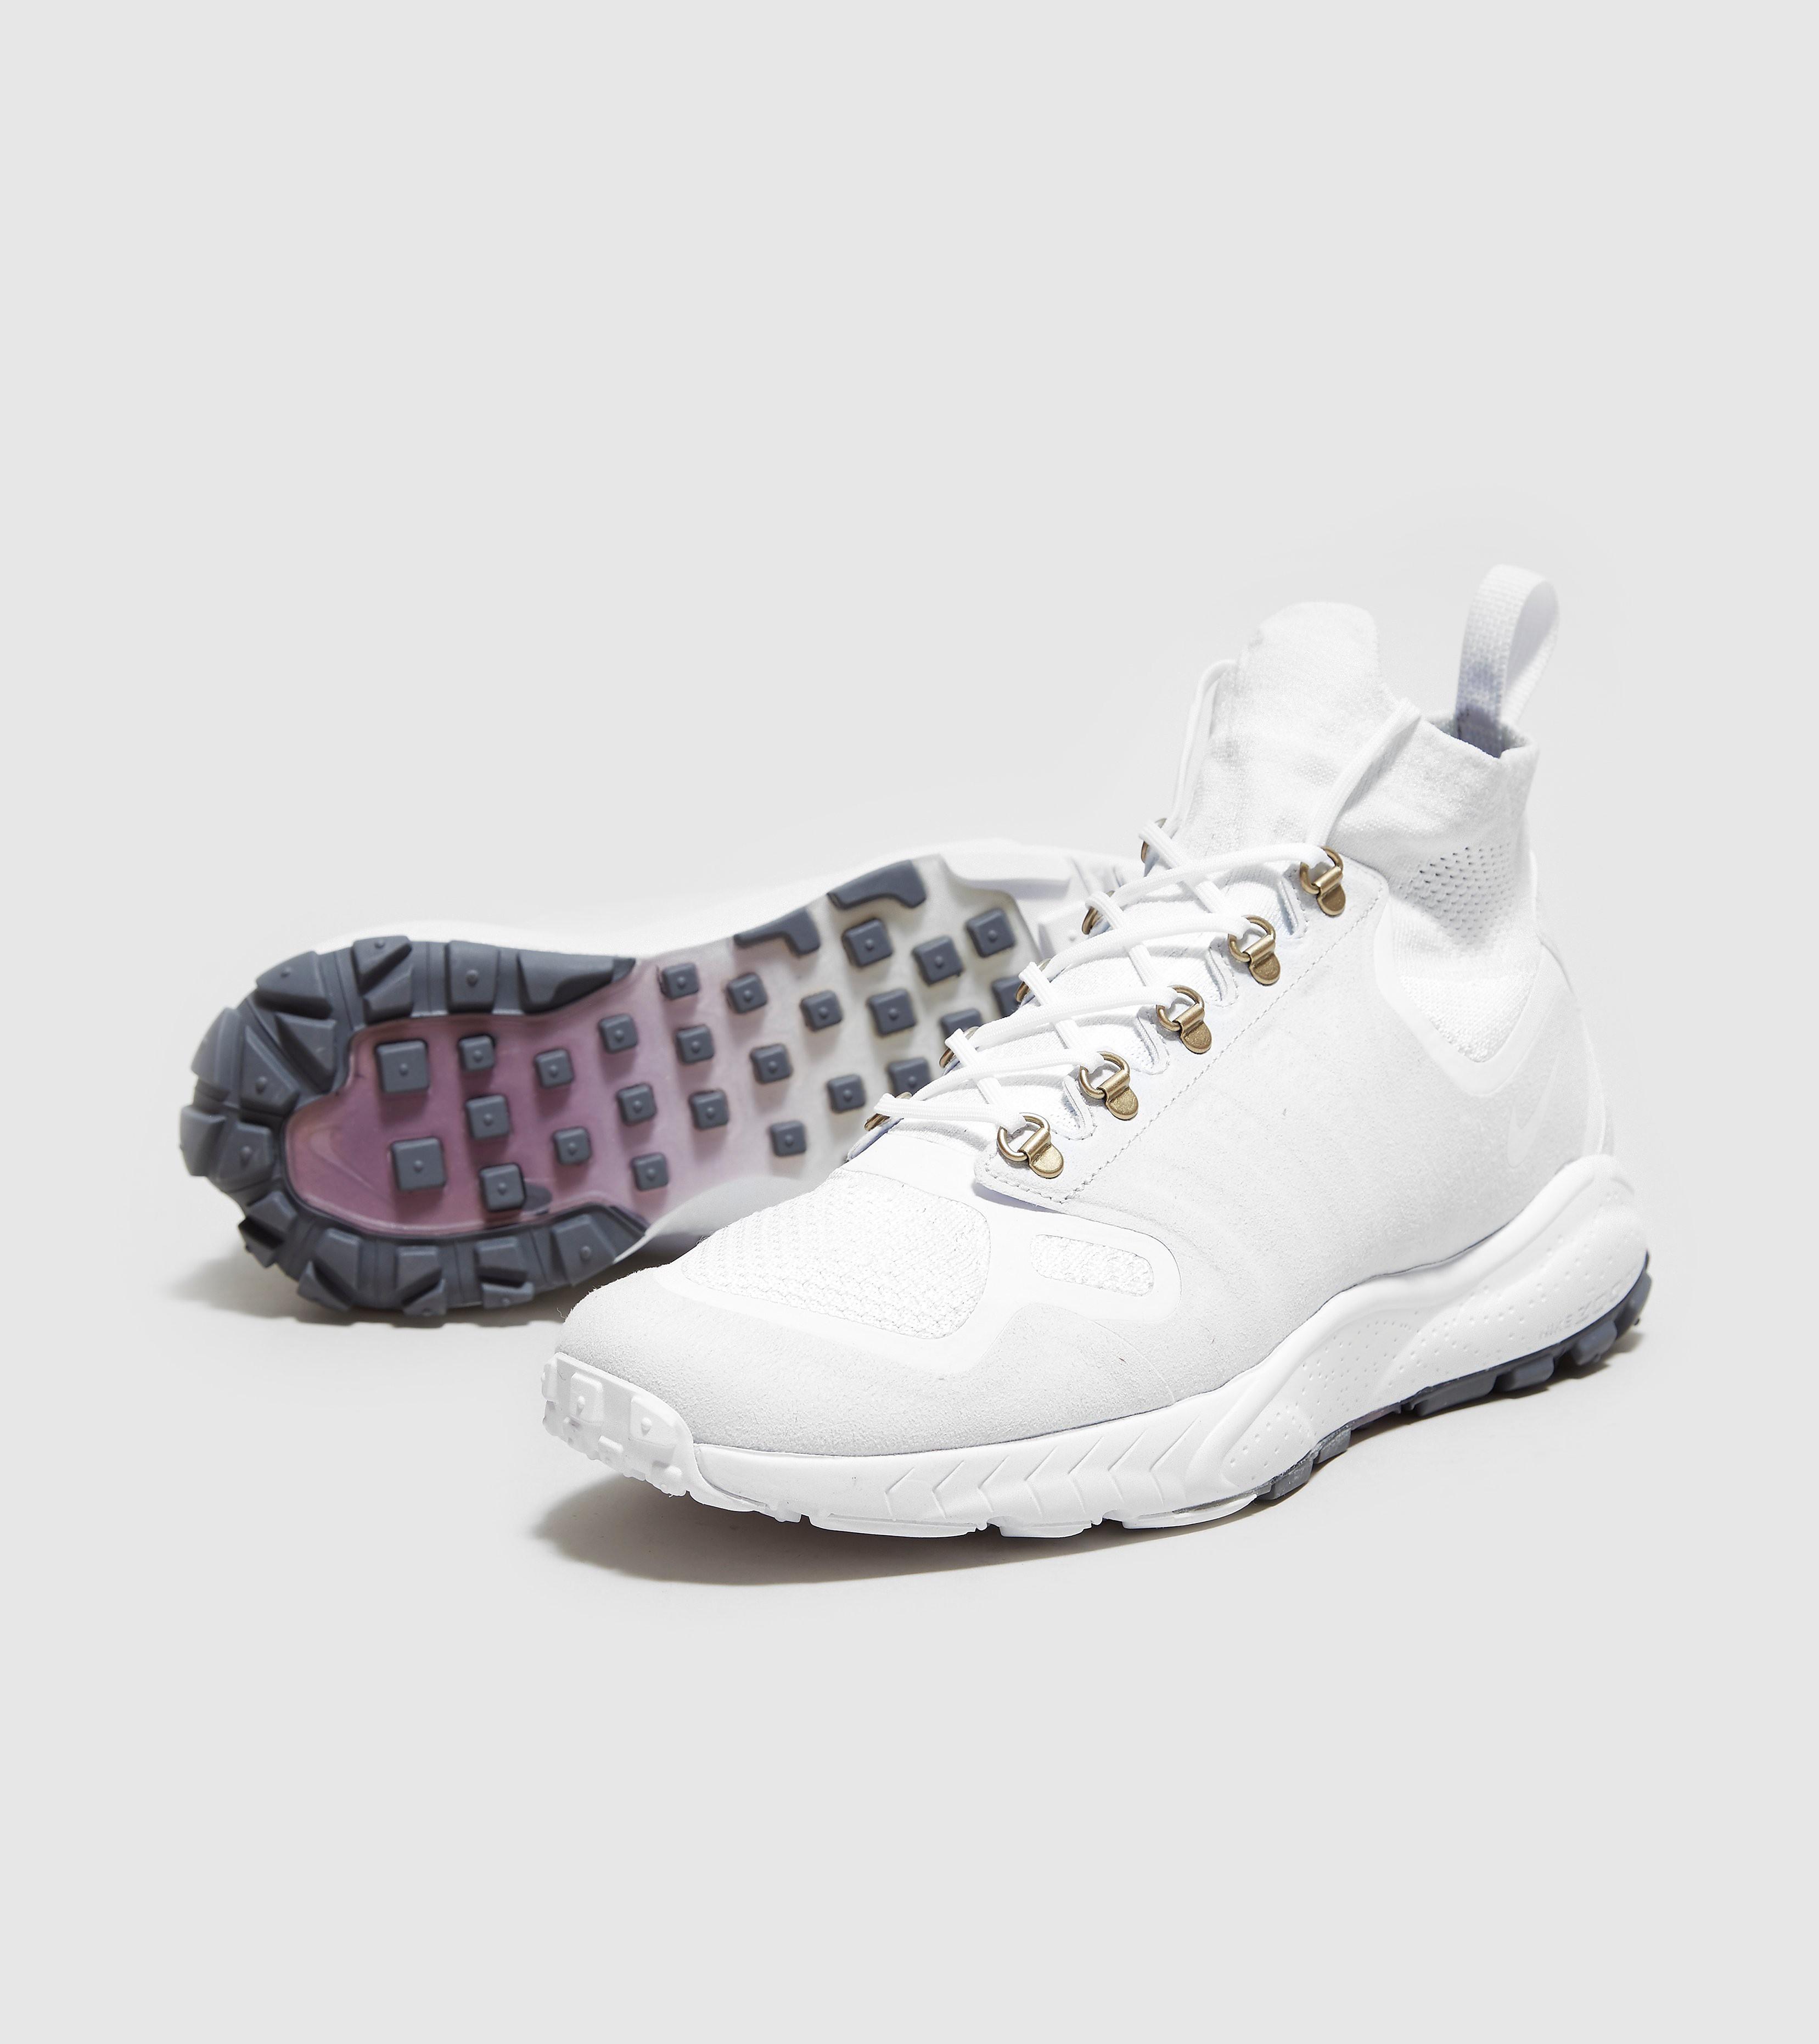 Nike Zoom Talaria Flyknit Mid